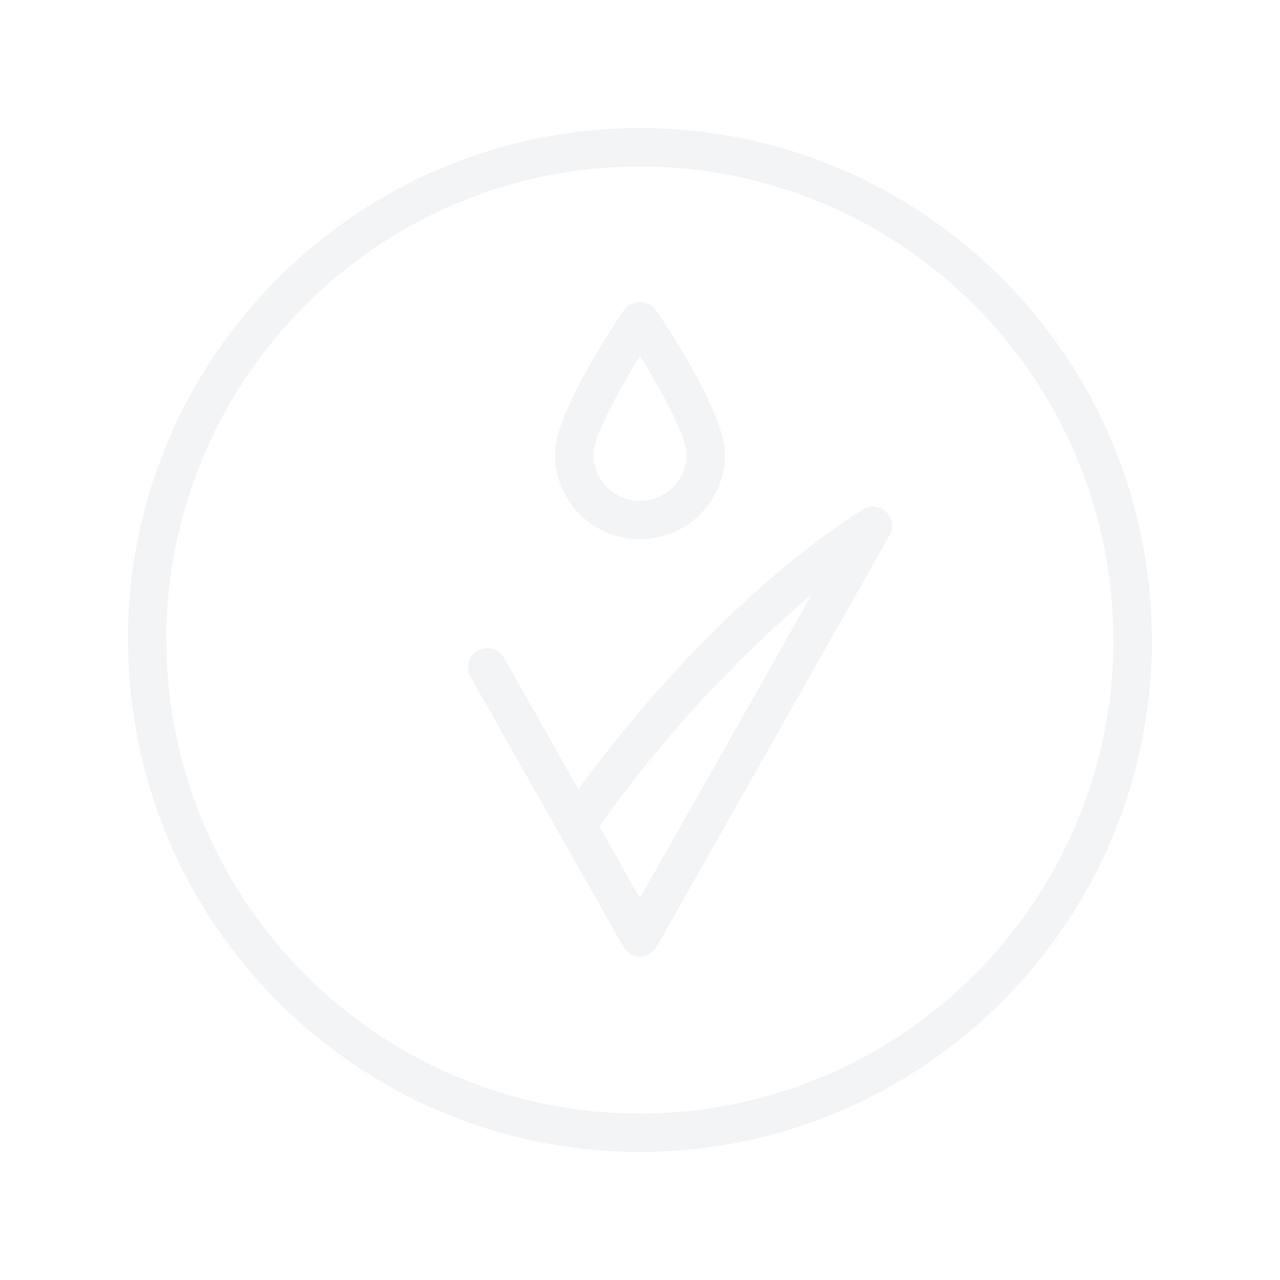 Yves Saint Laurent Mascara Volume Effet Faux Cils Waterproof 6.9ml